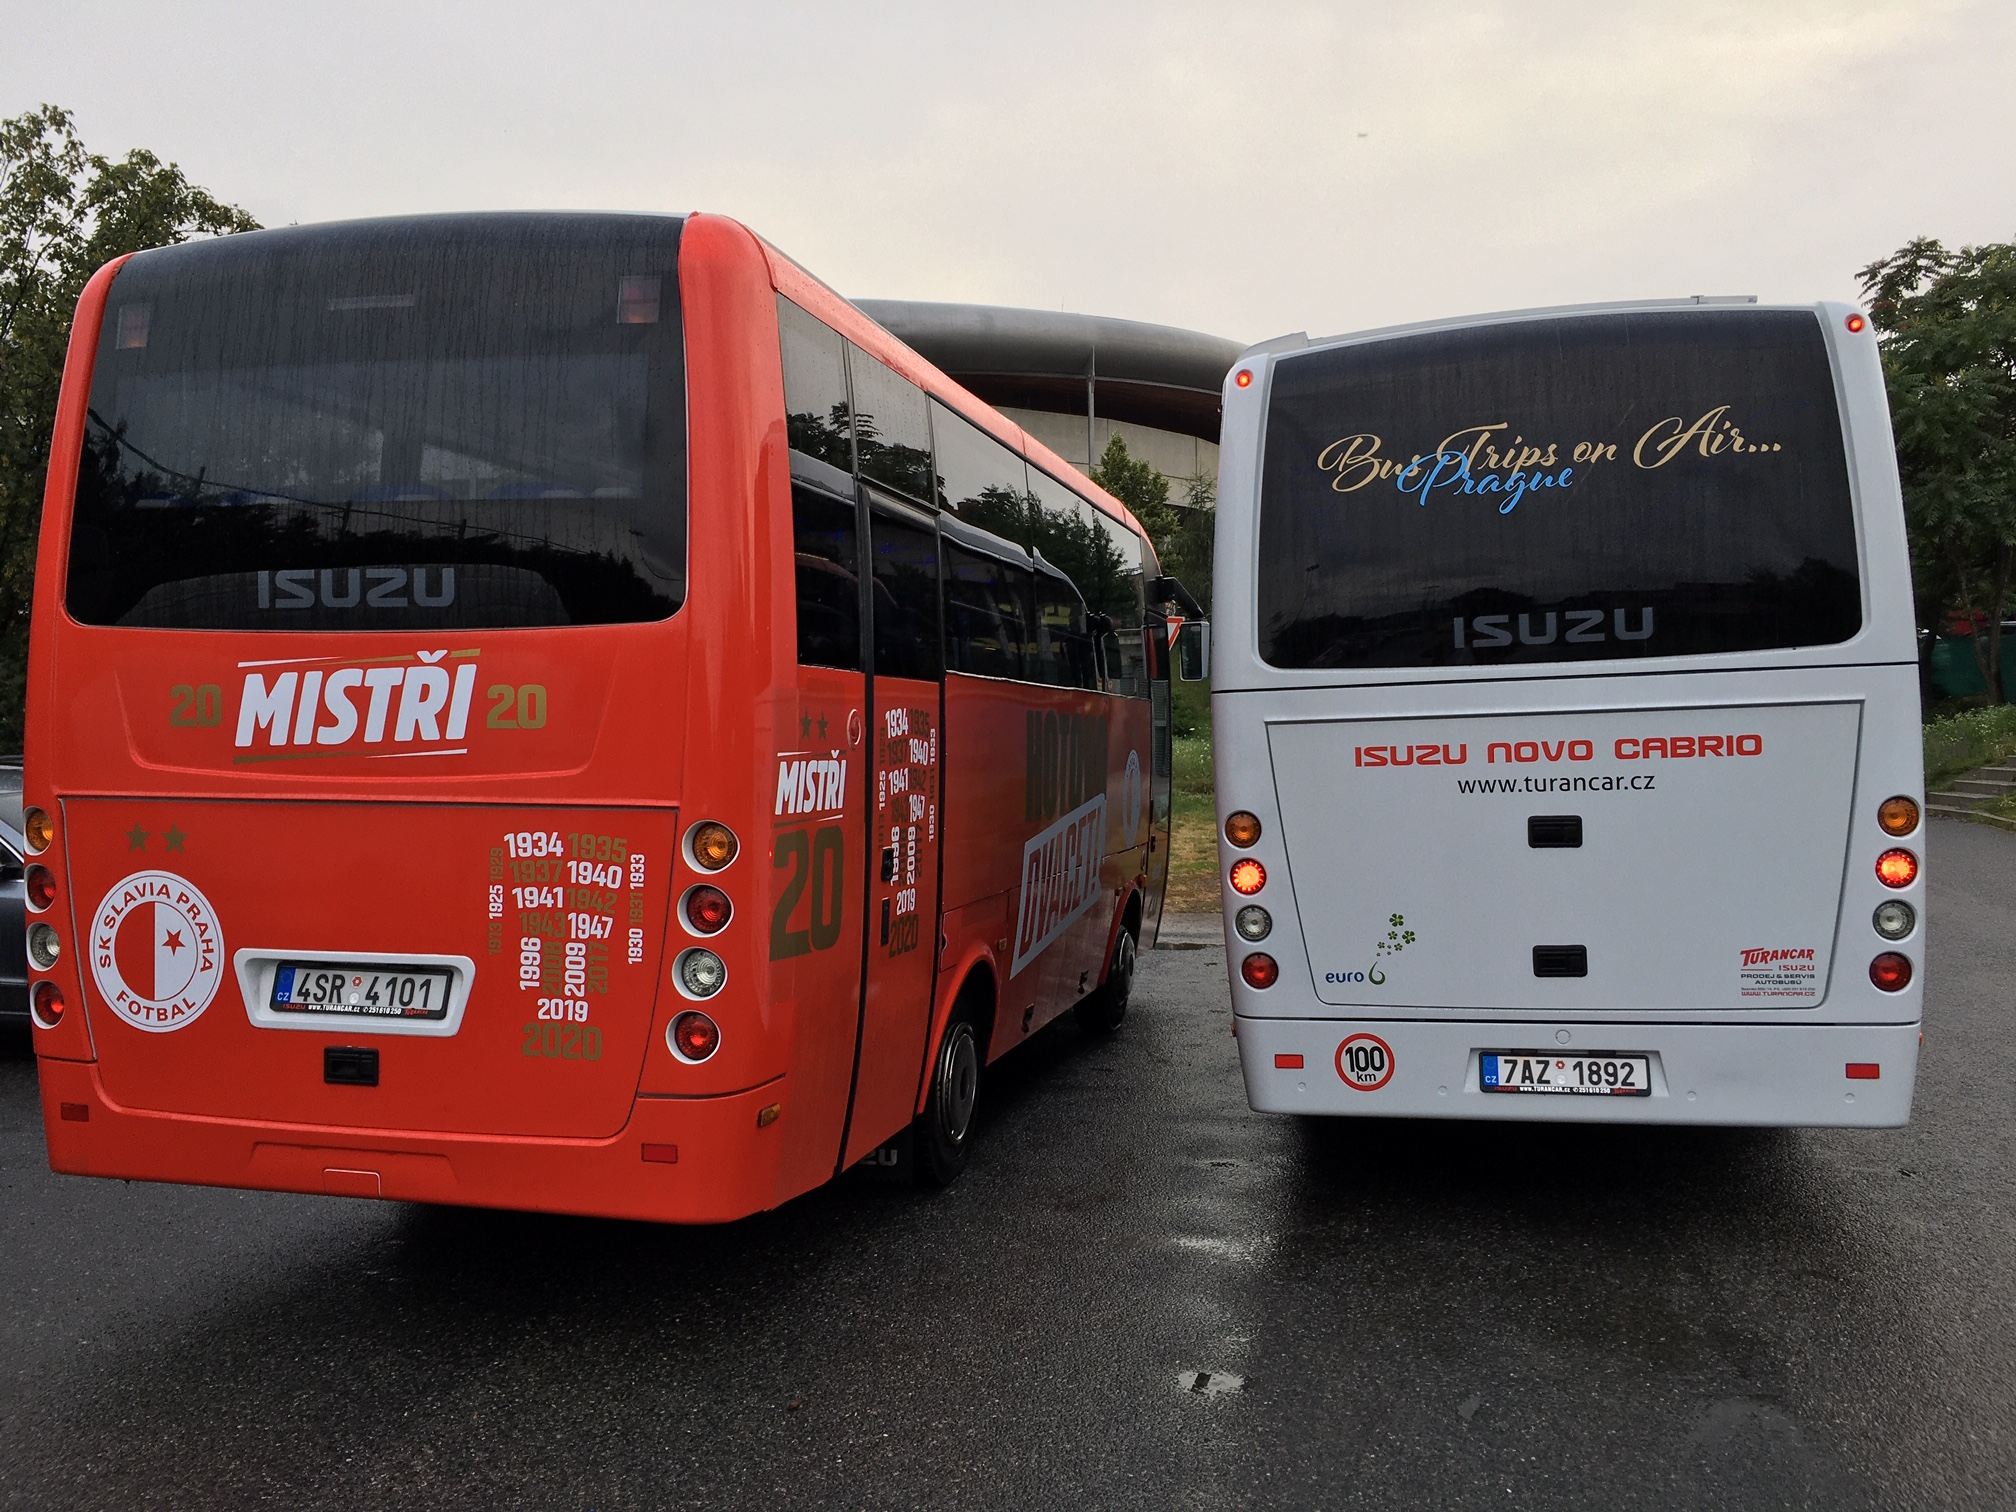 "Slavia mistr Fortuna ligy 2019 – 2020 ""HOTOVO 20!"" triumfální noční jízda Prahou autobusy ISUZU (foto: TURANCAR CZ)"